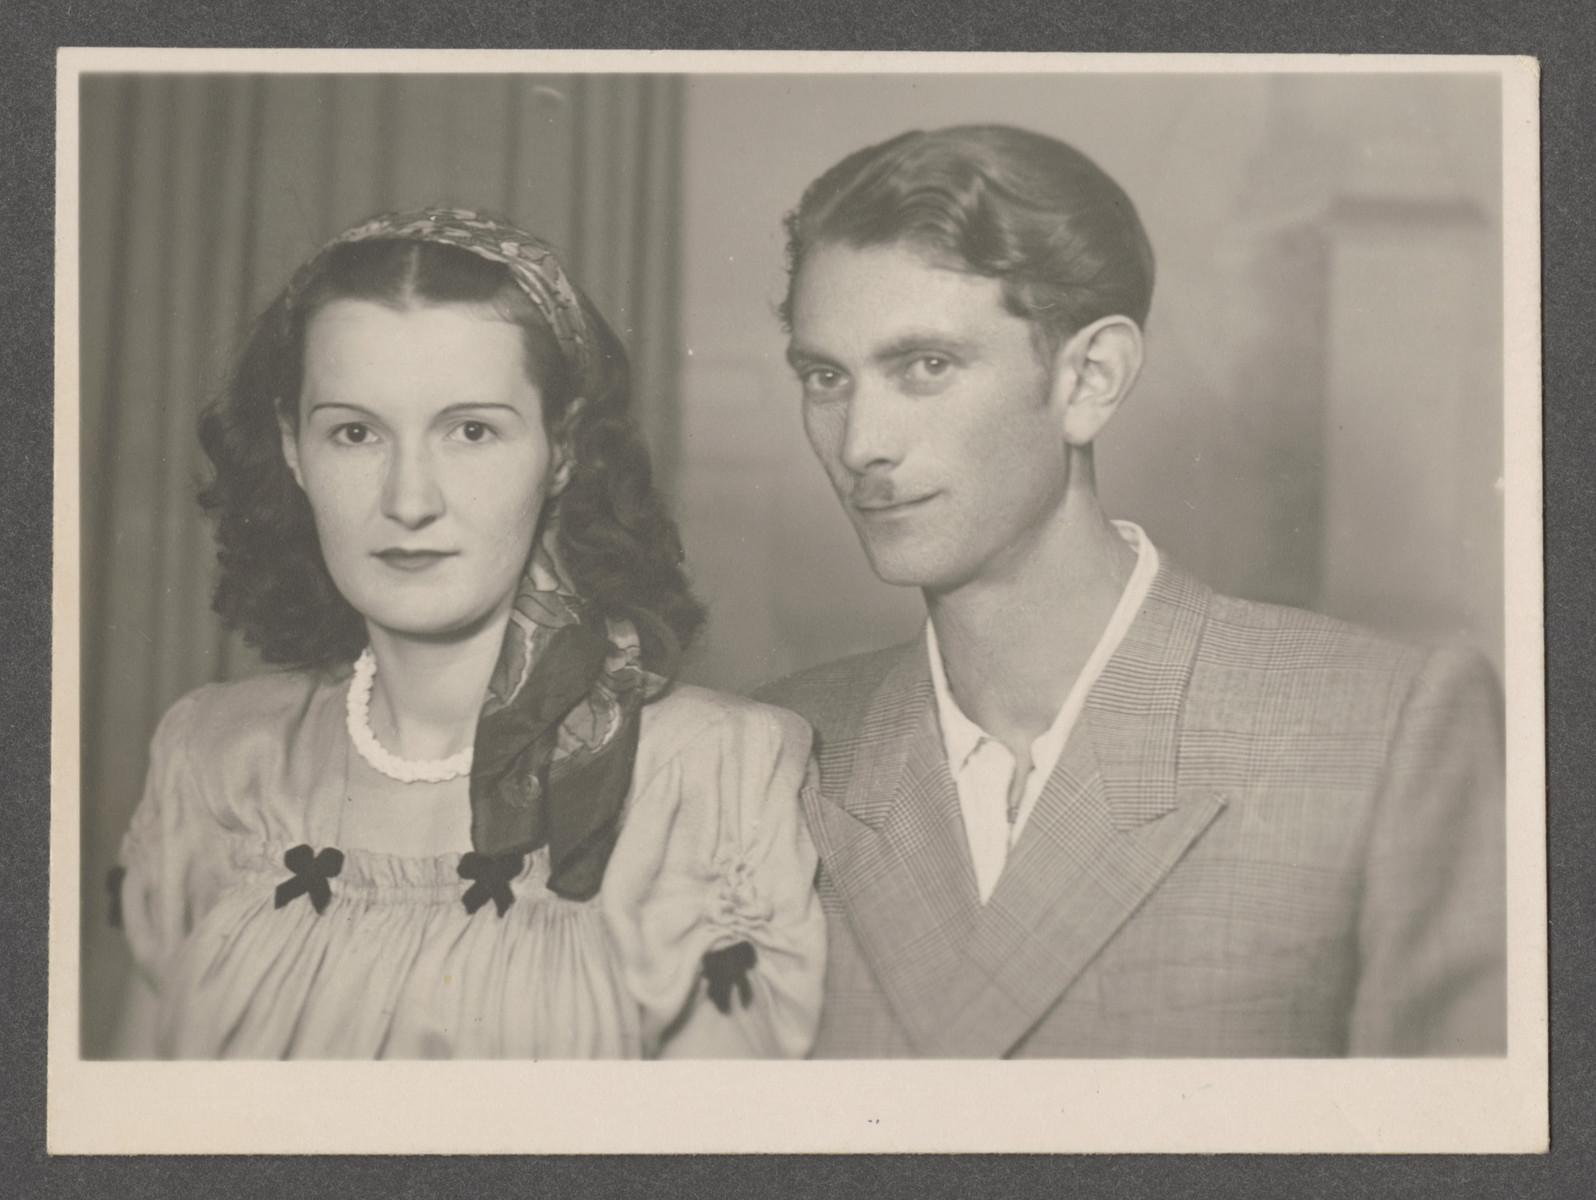 Studio portrait of Irena and Boris Scwarczman in postwar Poland.